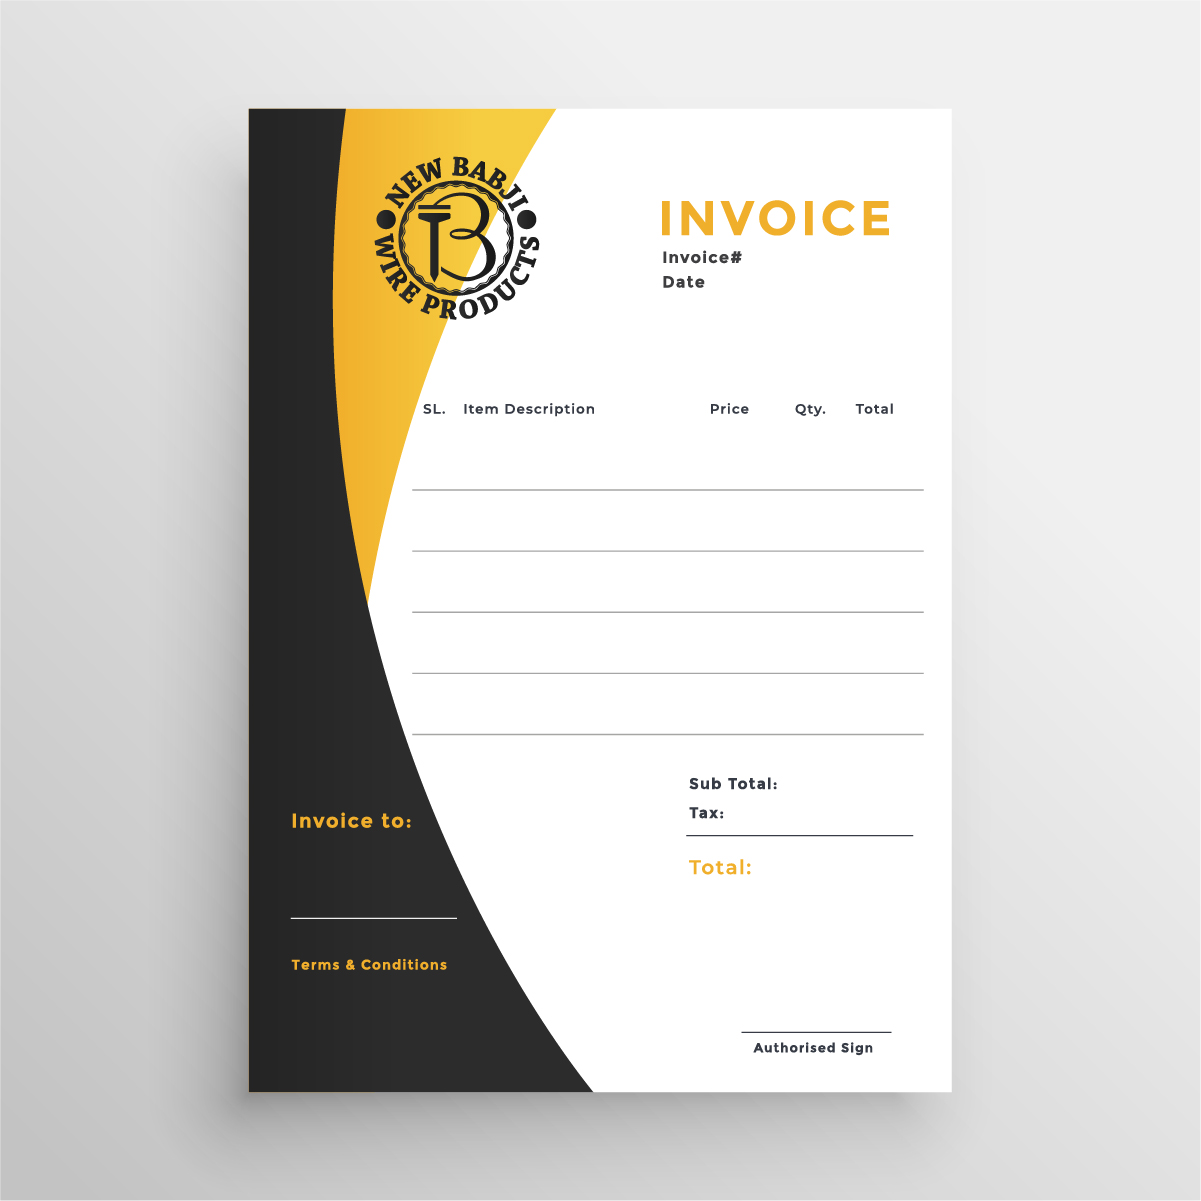 Invoice design for manufacturing company by Badri design